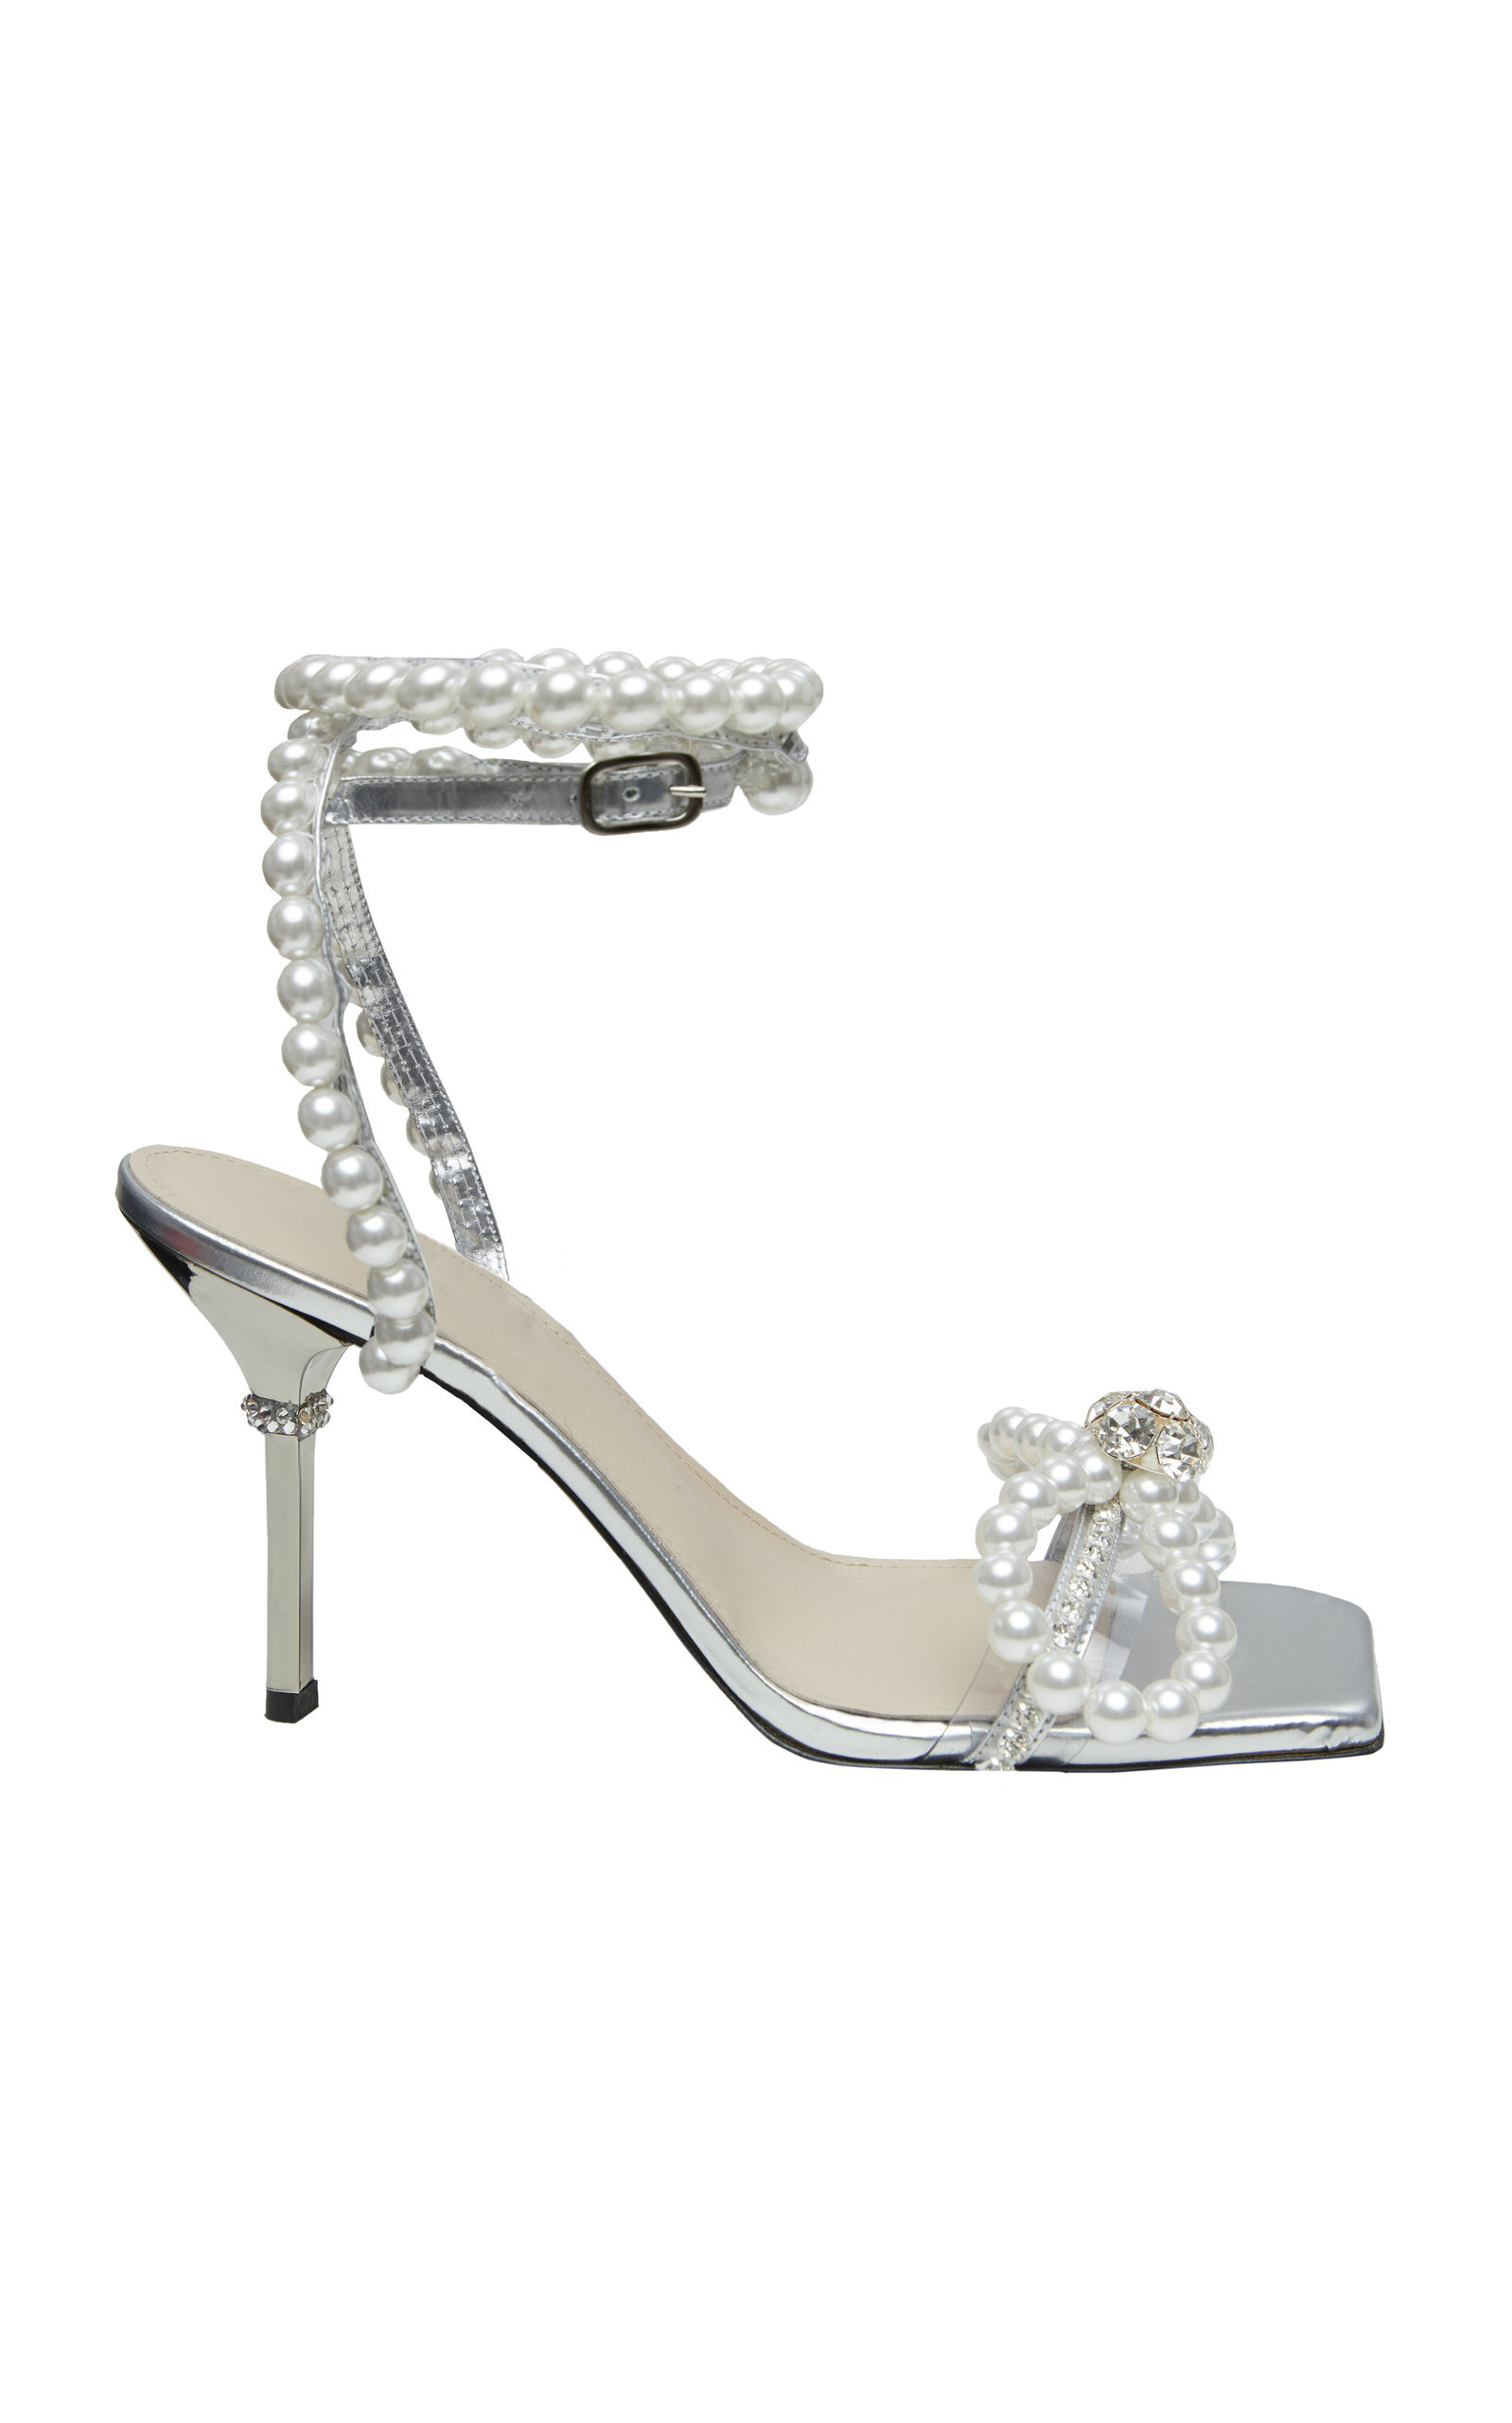 Women's Pearl Embellished Sandals